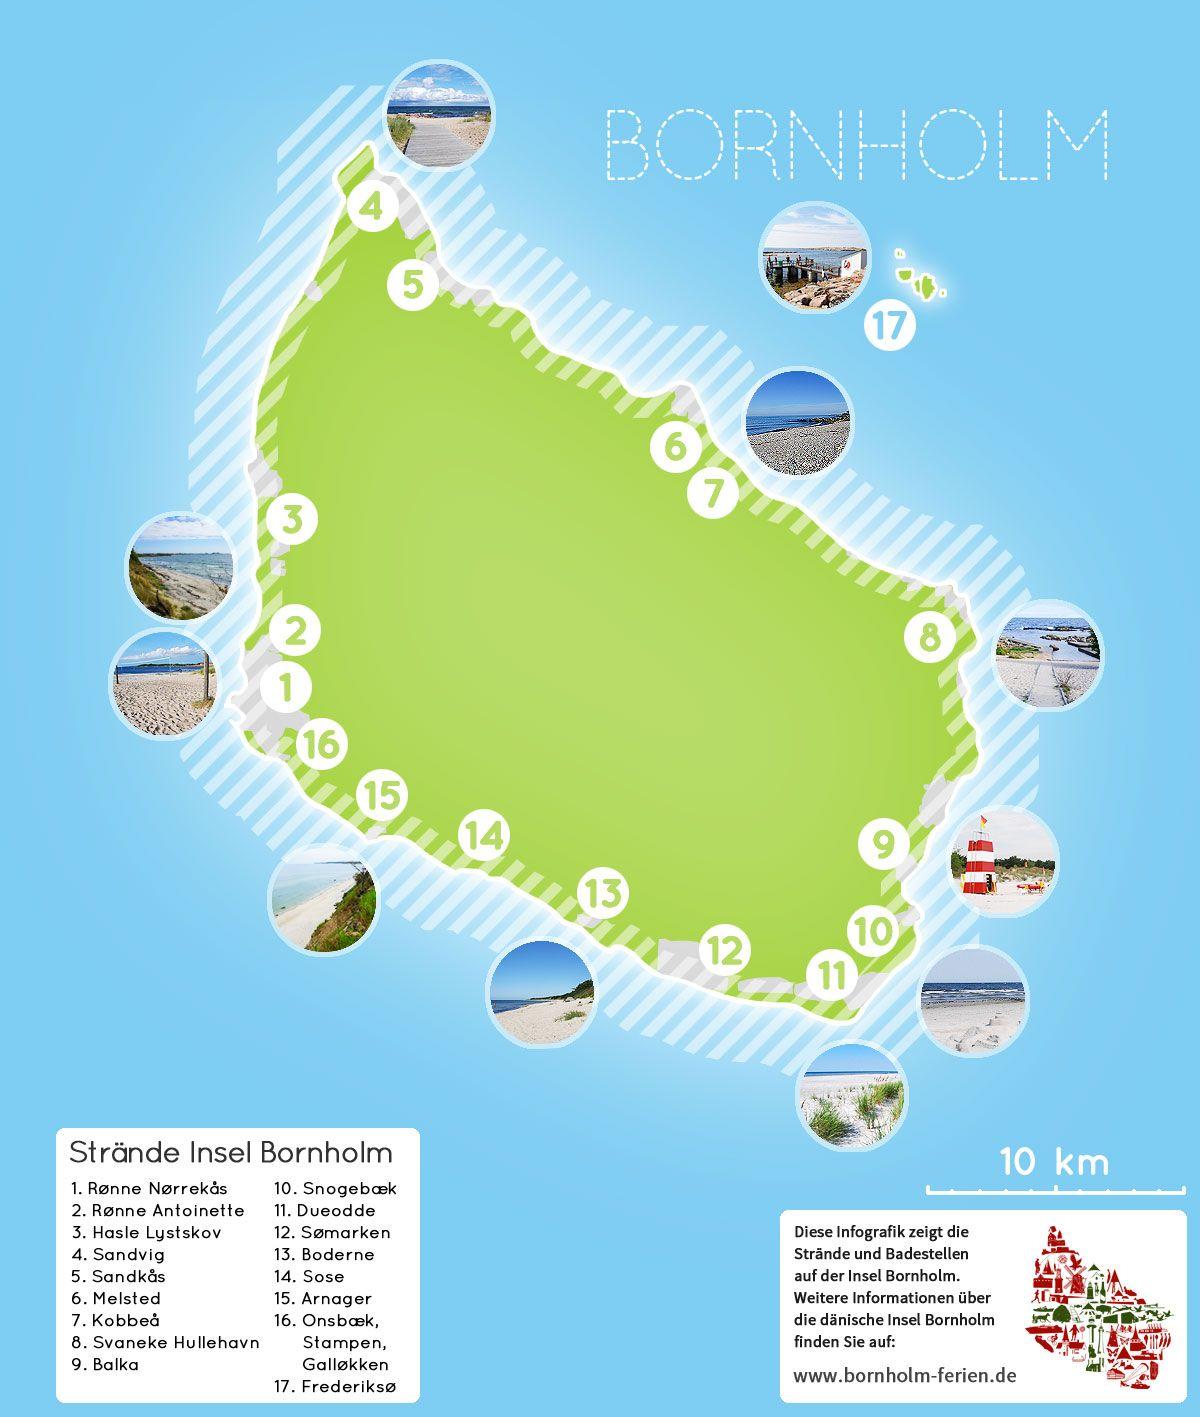 Ubersichts Karte Der Strande Auf Bornholm Bornholm Insel Strand